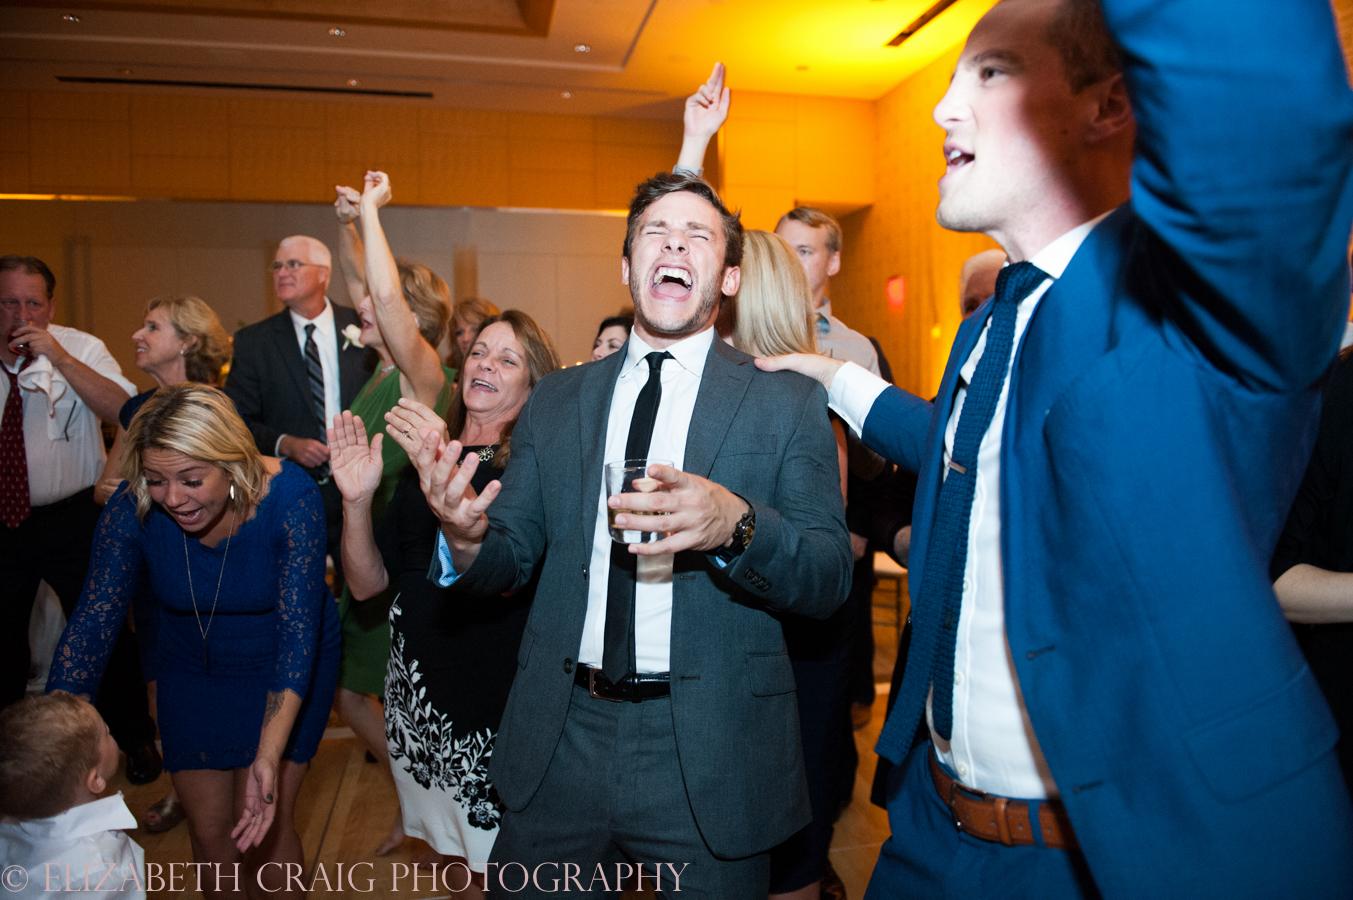 pittsburgh-greek-weddings-fairmont-weddings-receptions-elizabeth-craig-photohgraphy-032